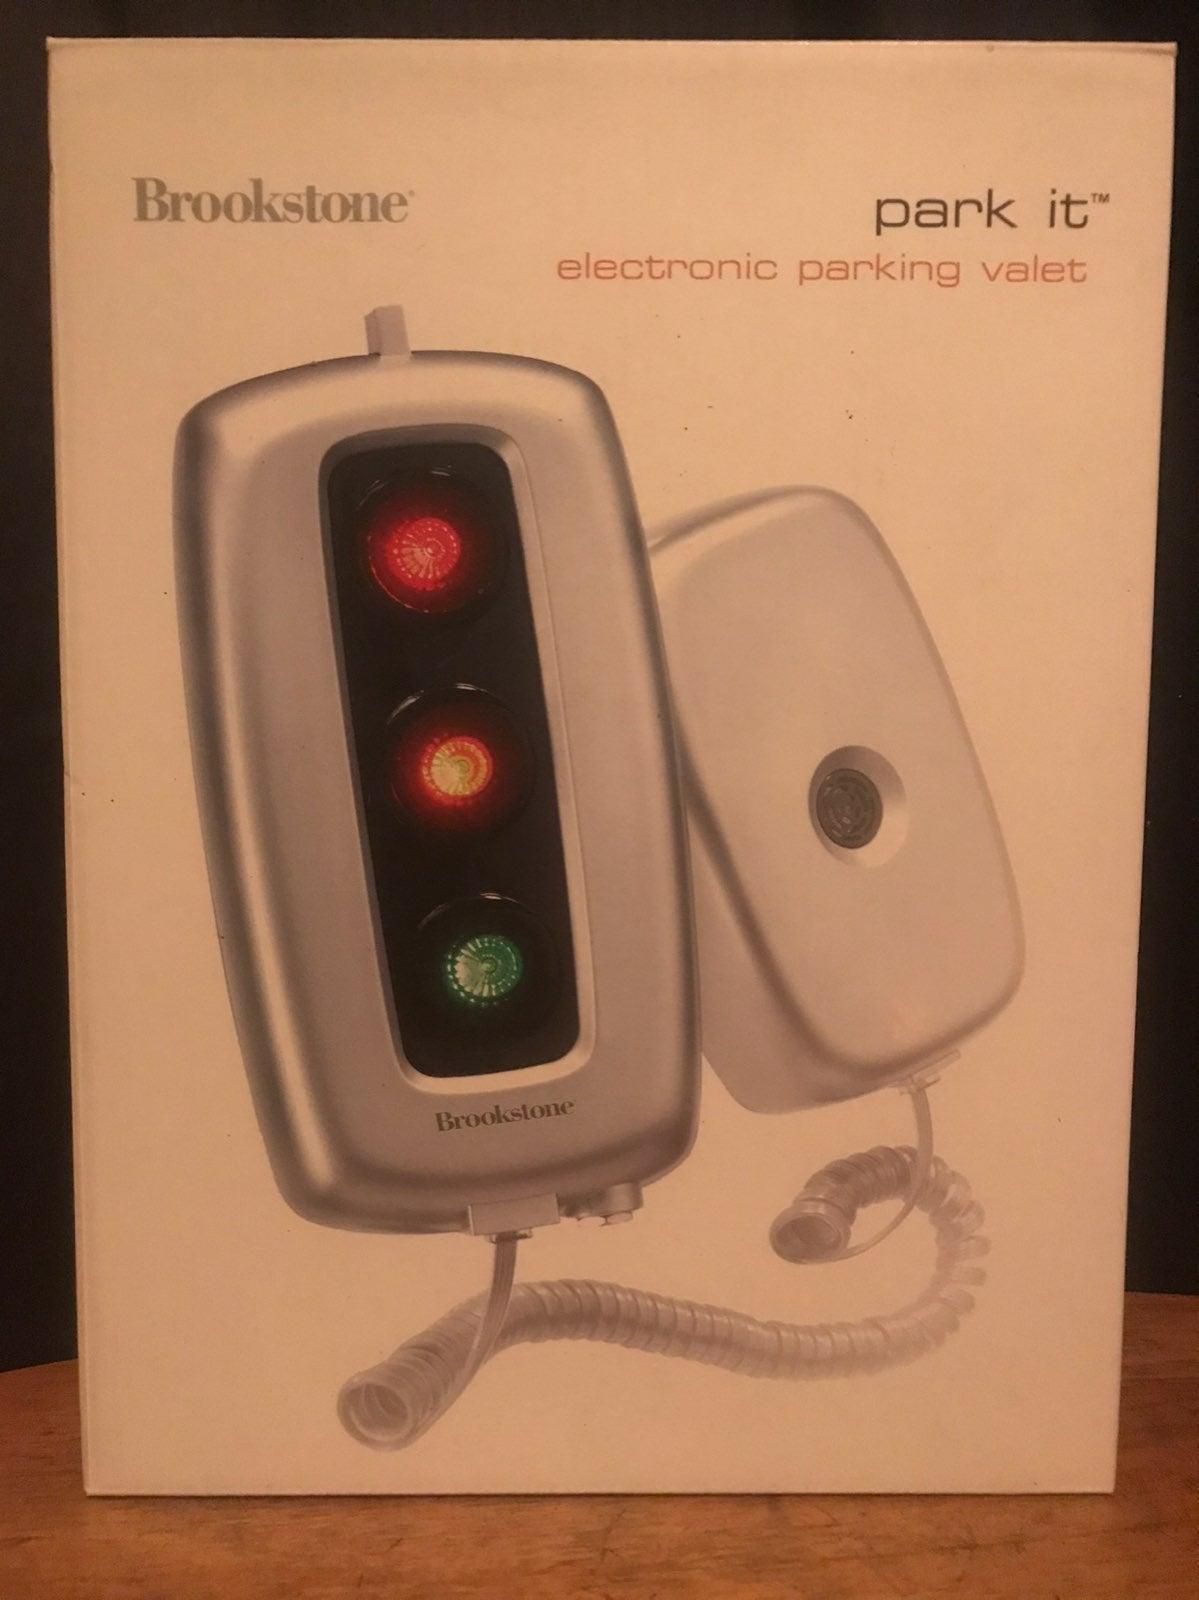 Brookstone Electronic Parking Valet